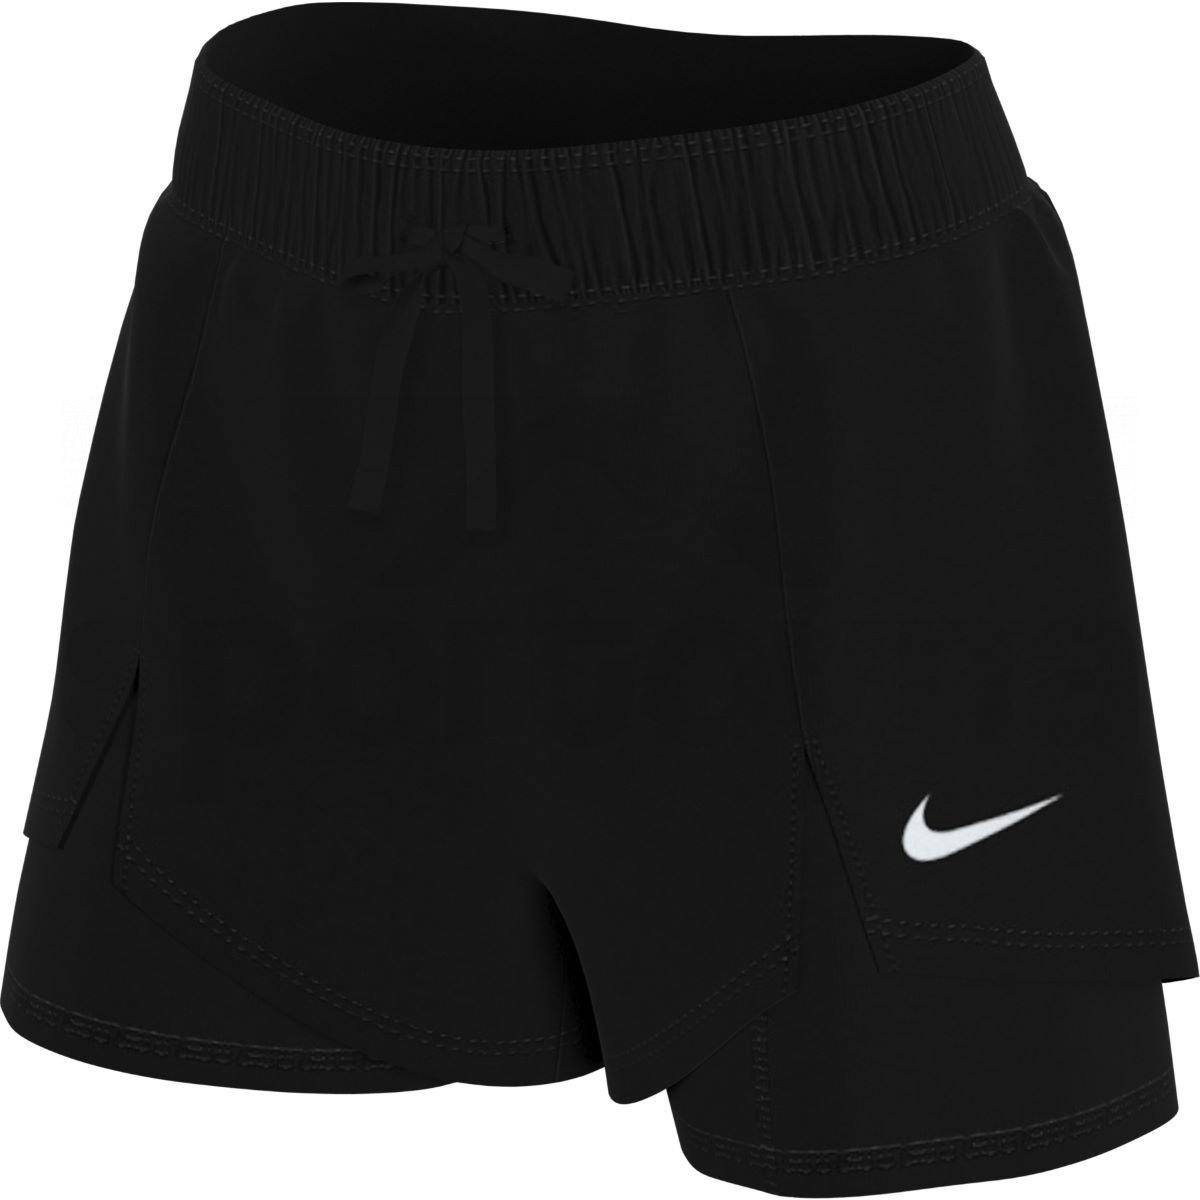 nike-flex-essential-2-in-1-womens-training-shorts-black-black-white-da0453-0116-918925